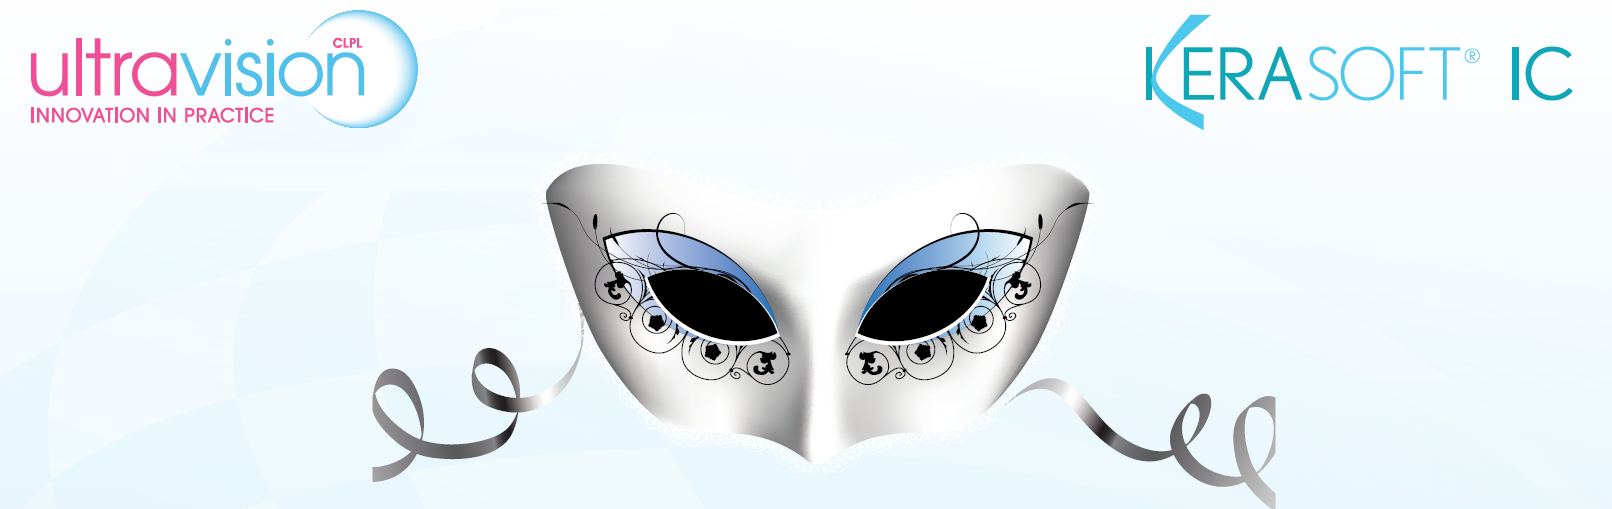 Ultravision logo